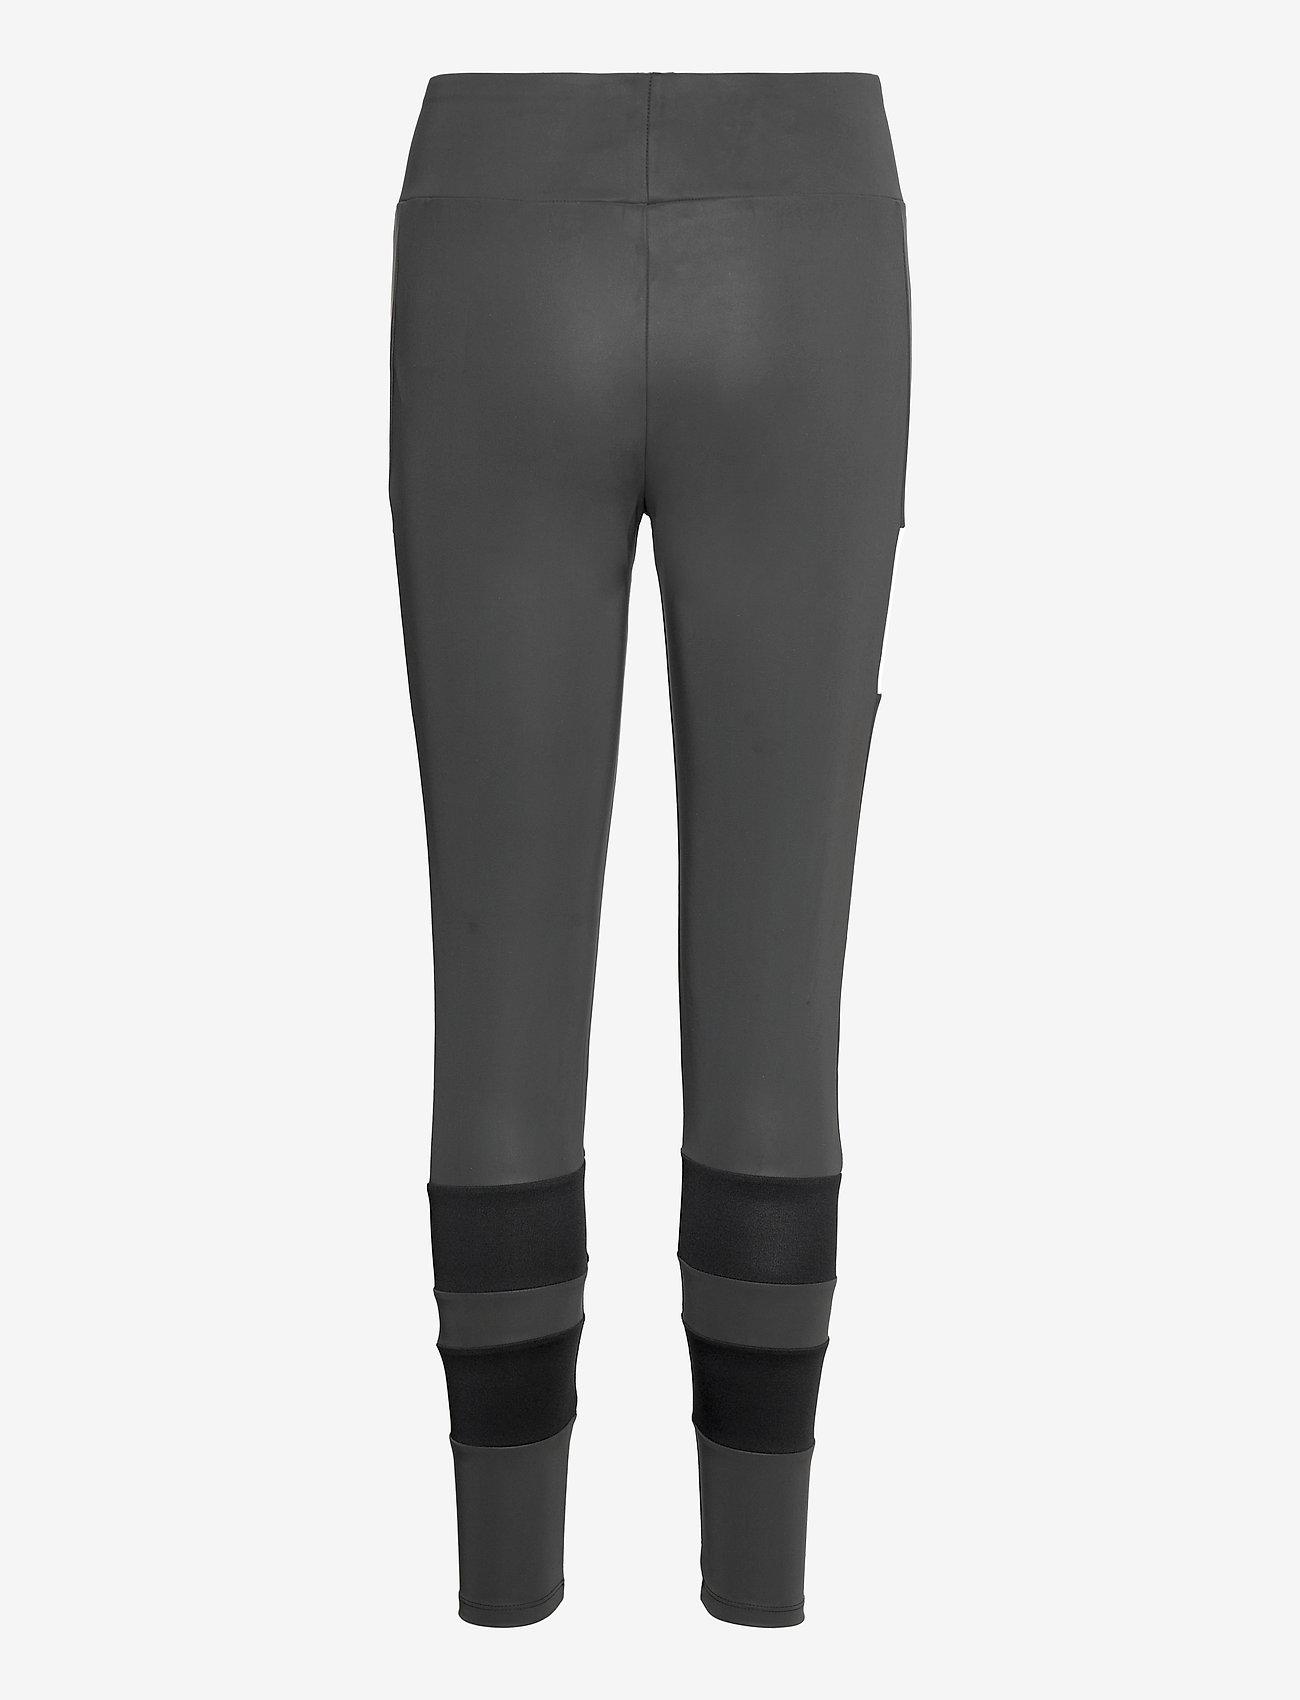 Ellesse - EL PEREZI LEGGING - running & training tights - black - 1